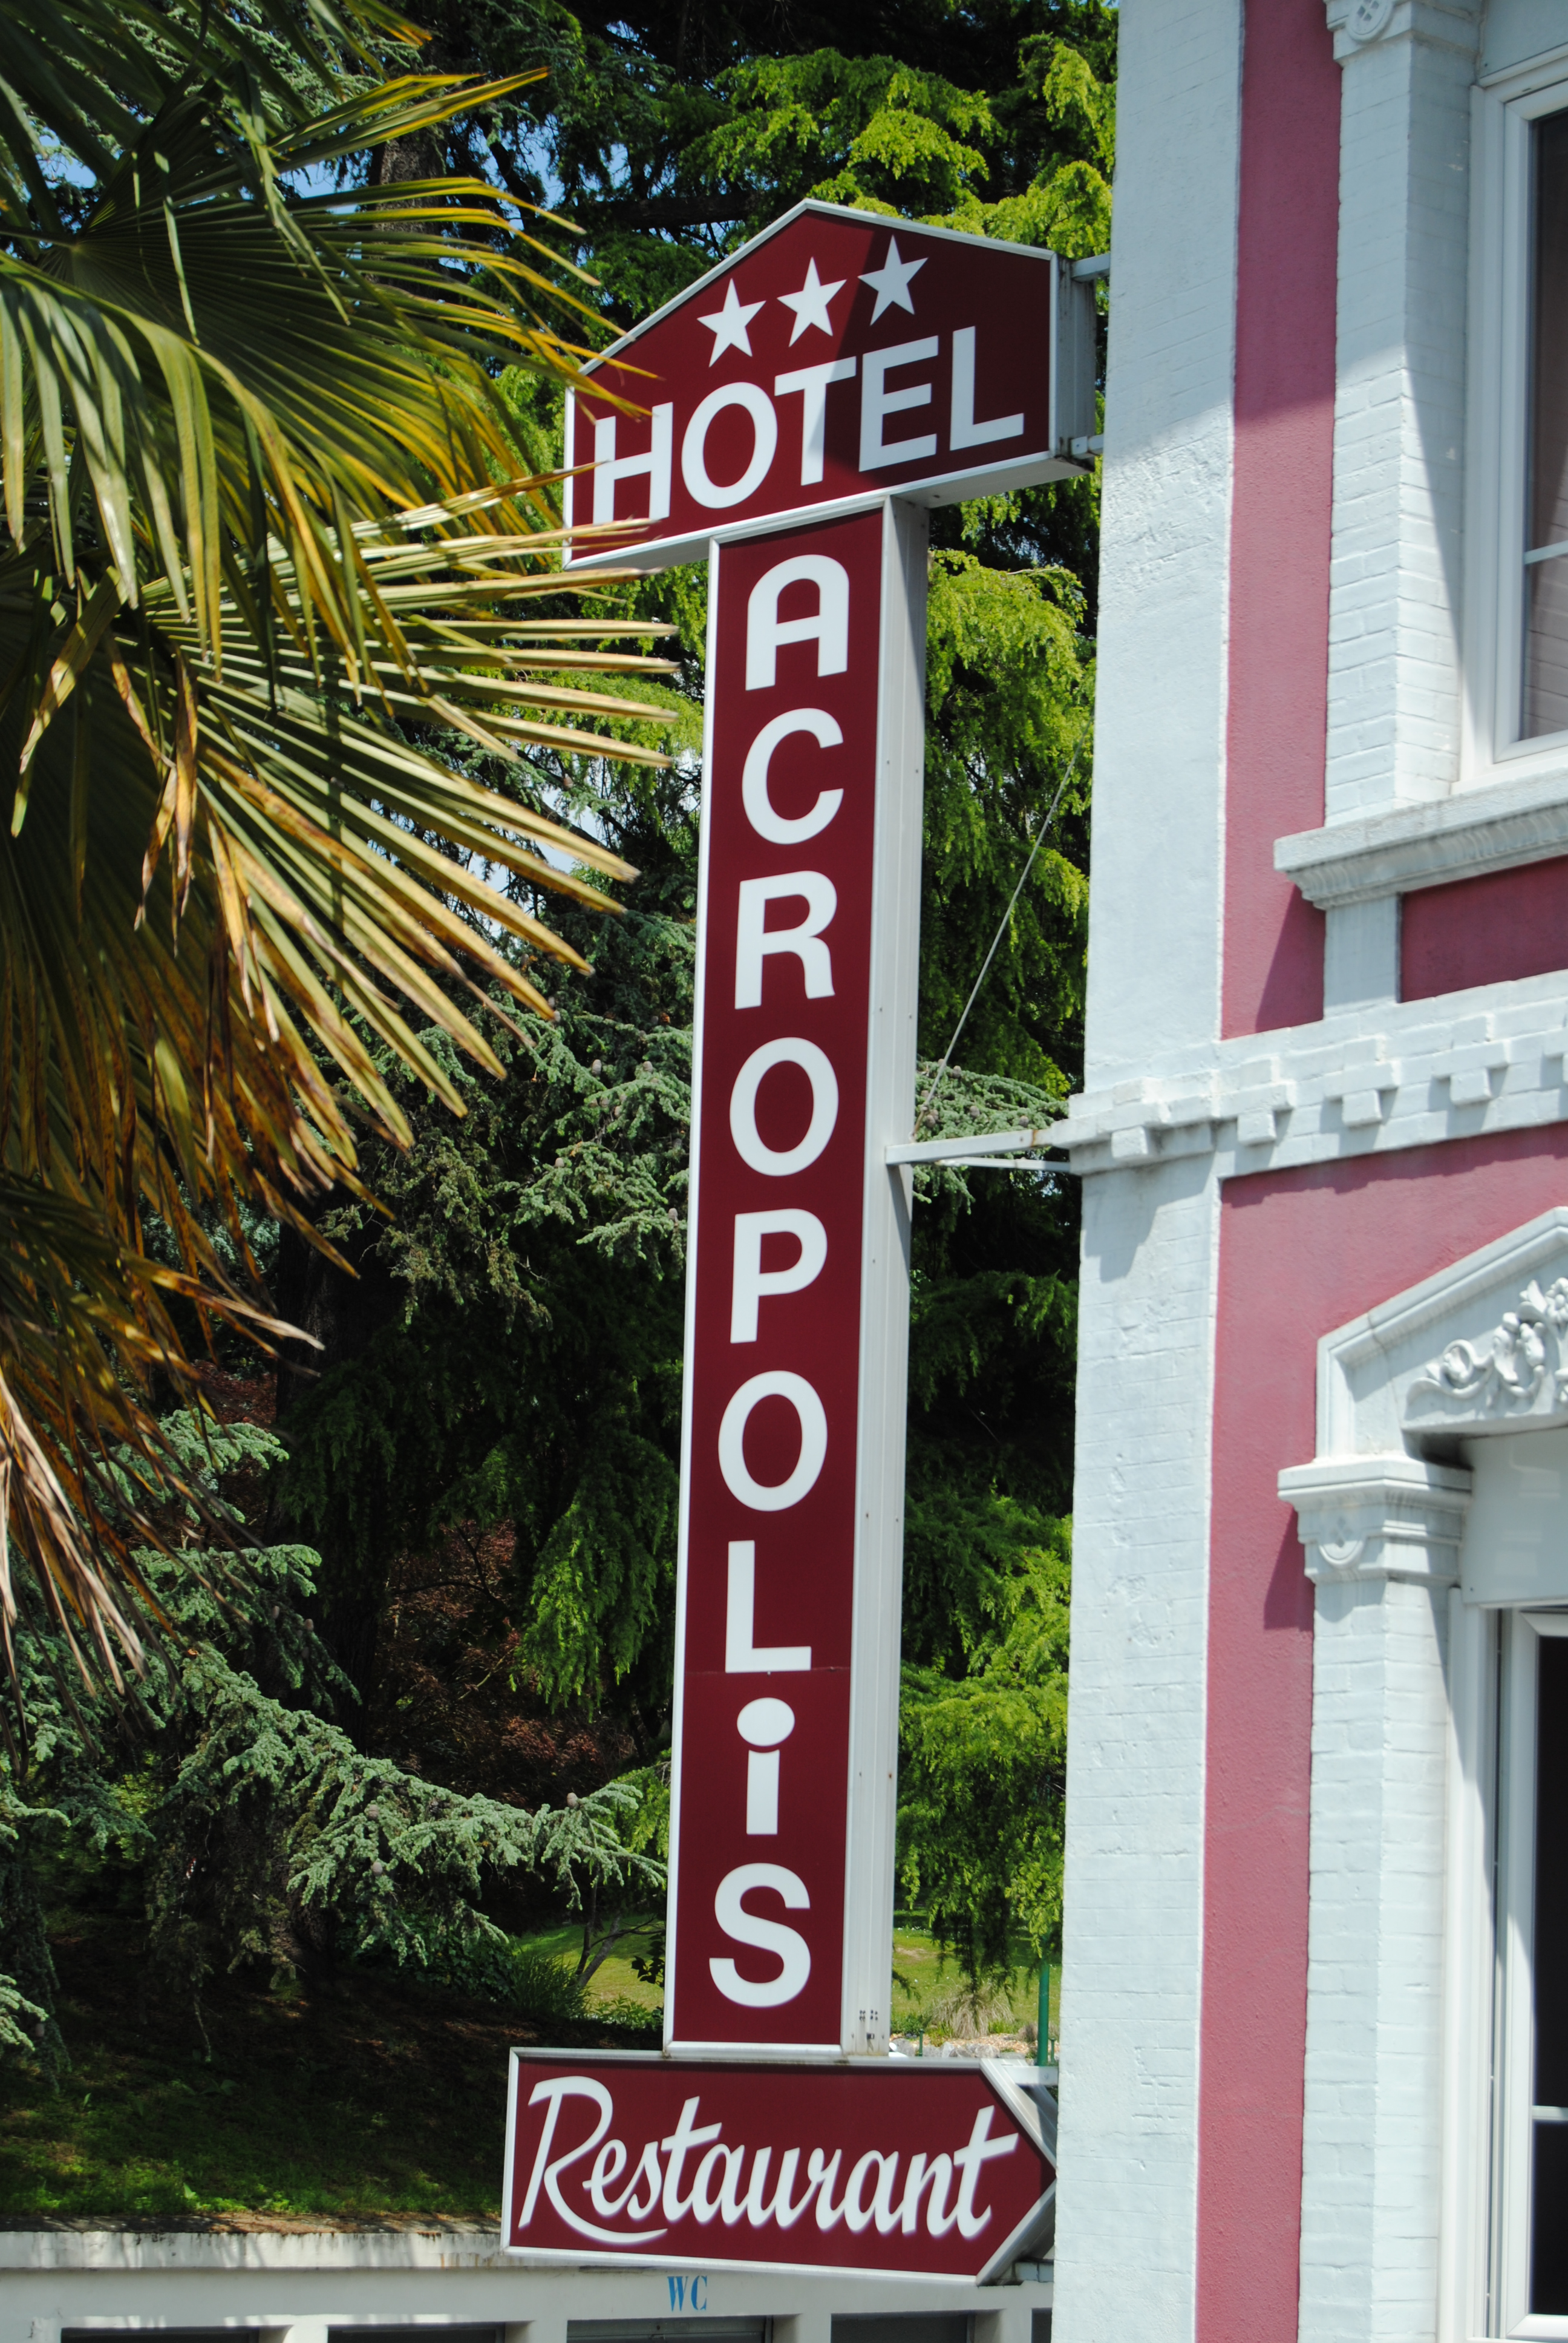 Lourdes hotel Acropolis (5)